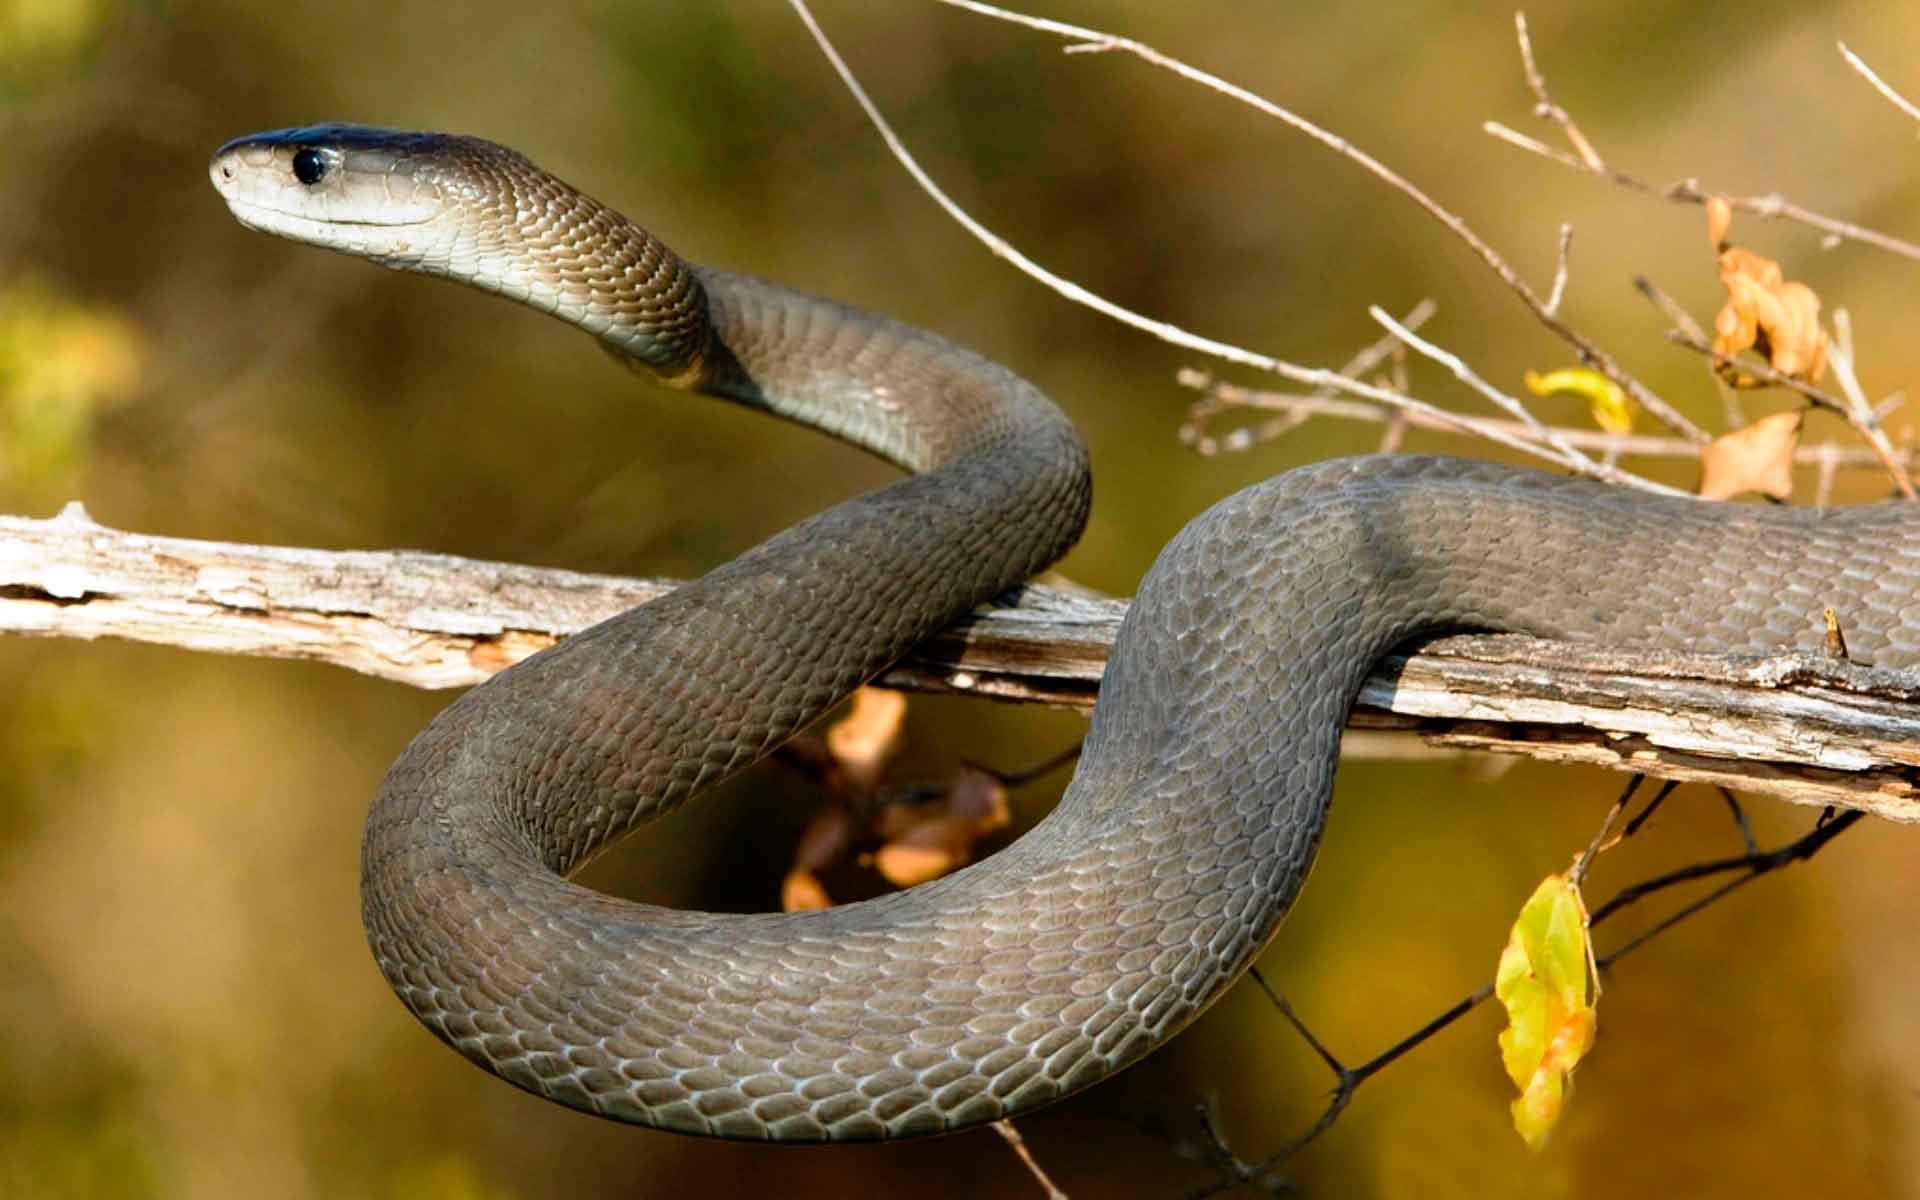 Змеи – виды и описание с названиями, характеристики, типы | фото и видео змей